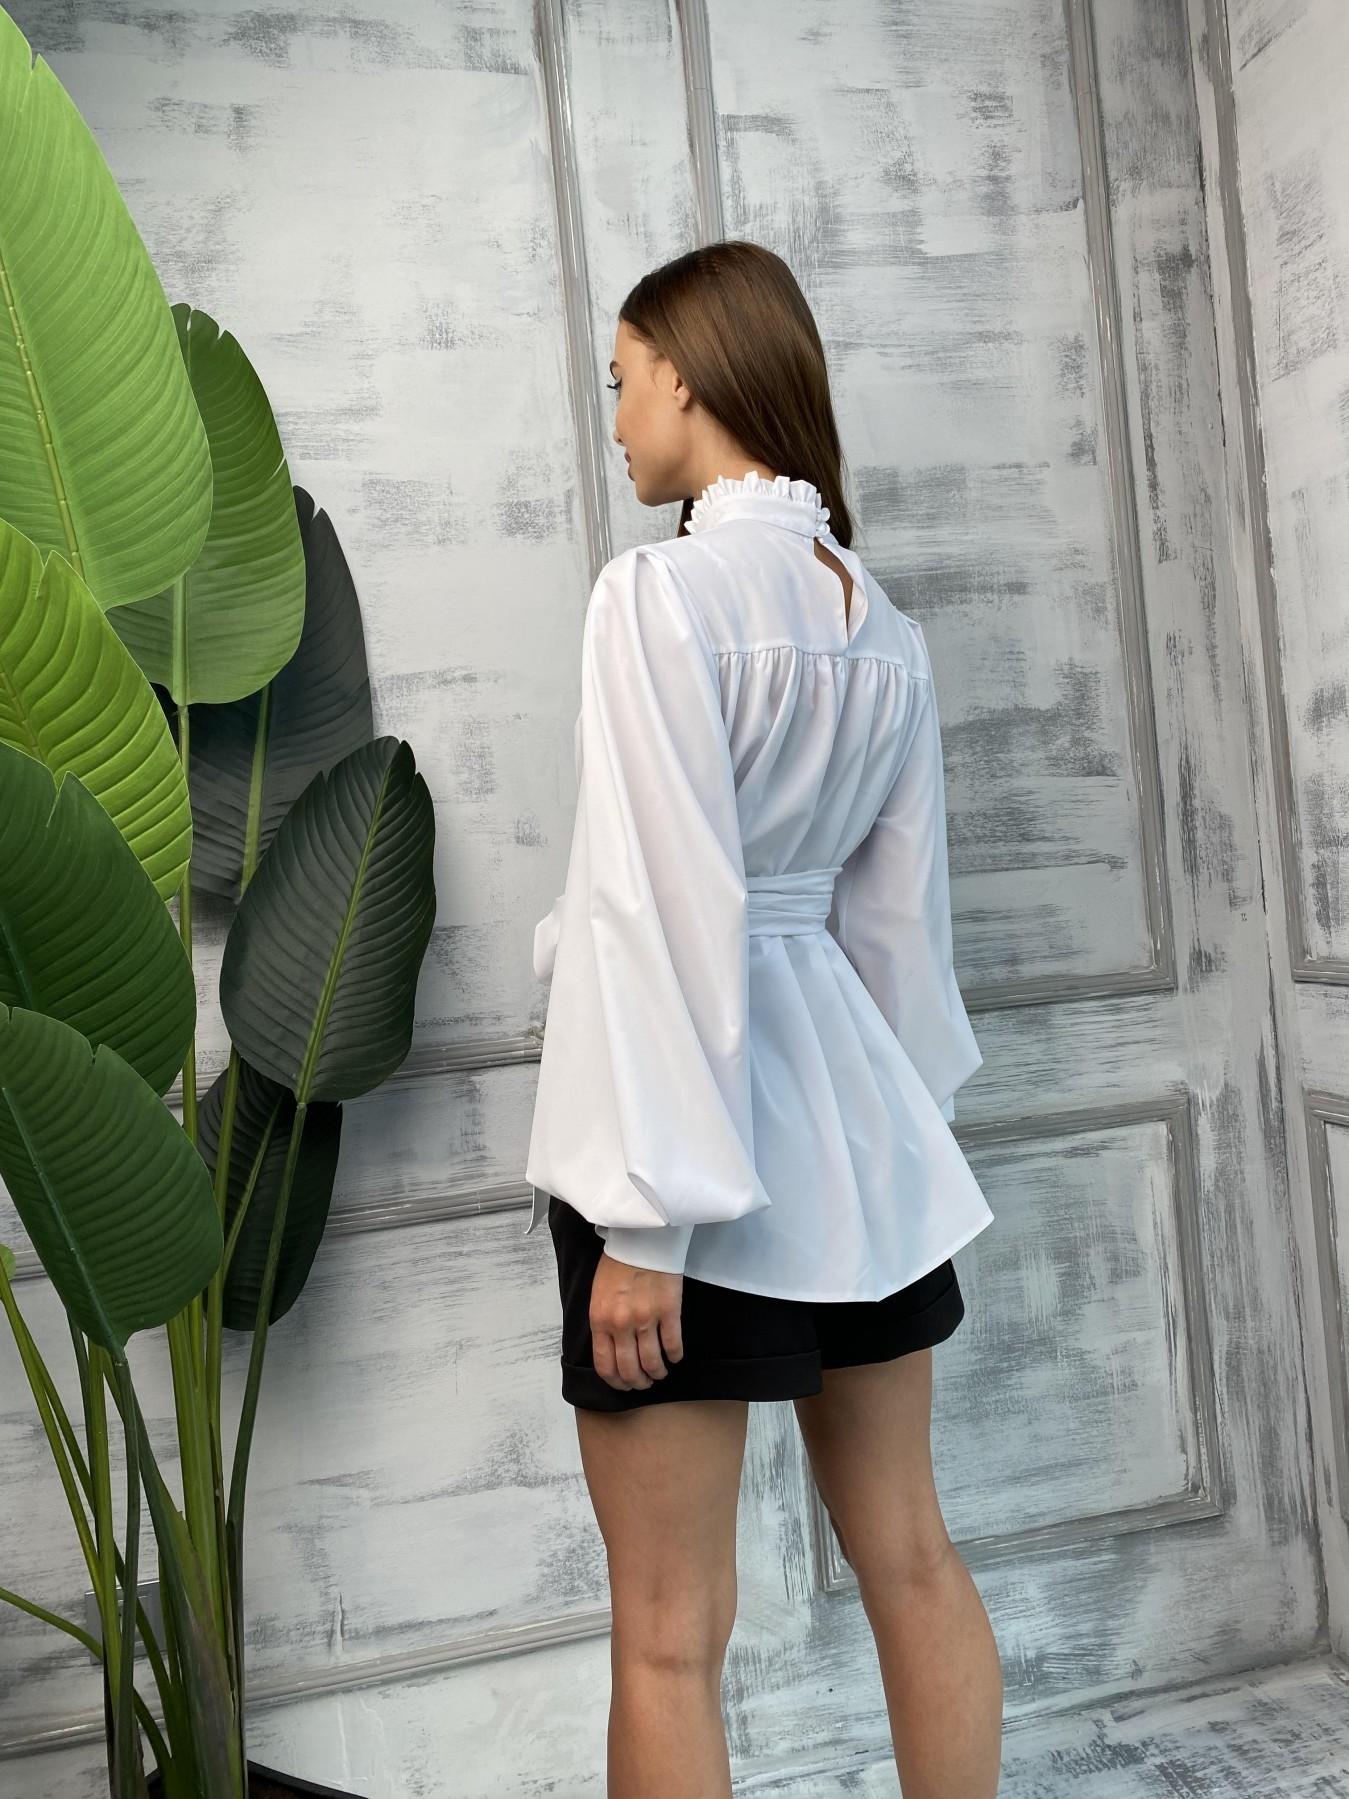 Аметист Д/р софт однотонный блуза 11693 АРТ. 48397 Цвет: Белый - фото 3, интернет магазин tm-modus.ru